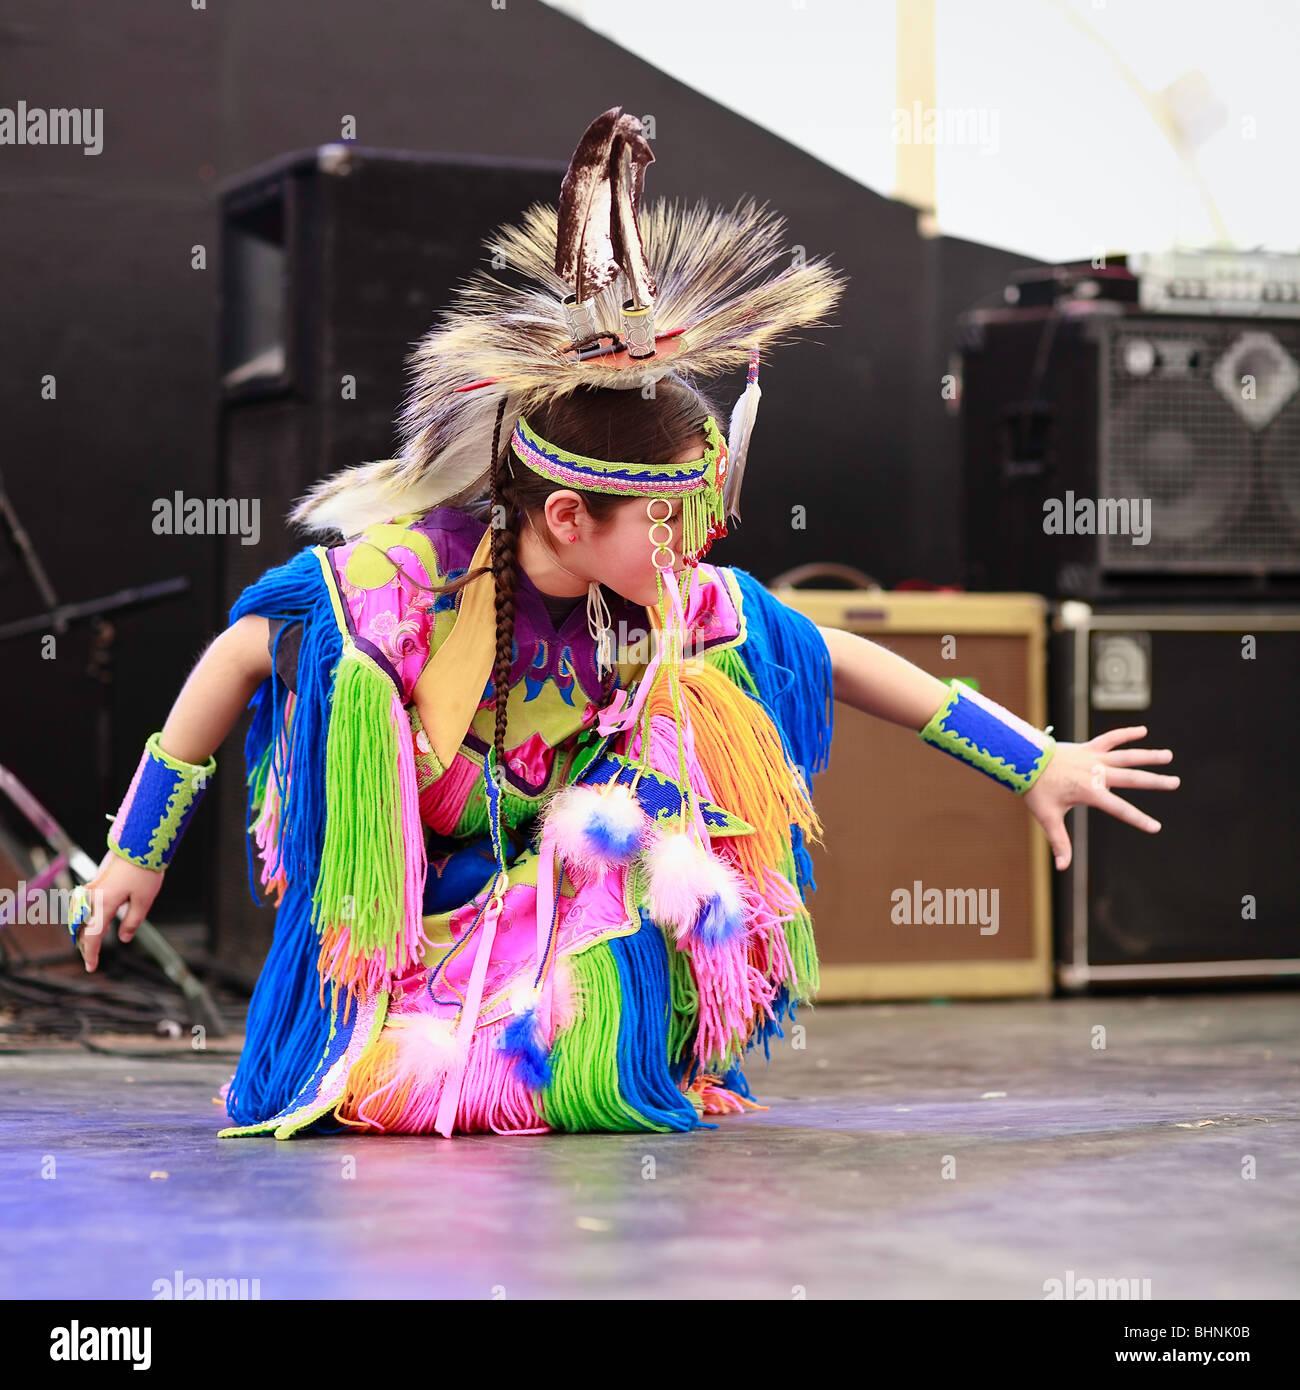 Manitoba Native Plants: Young Native Canadian Girl Dancing, Festival Du Voyageur